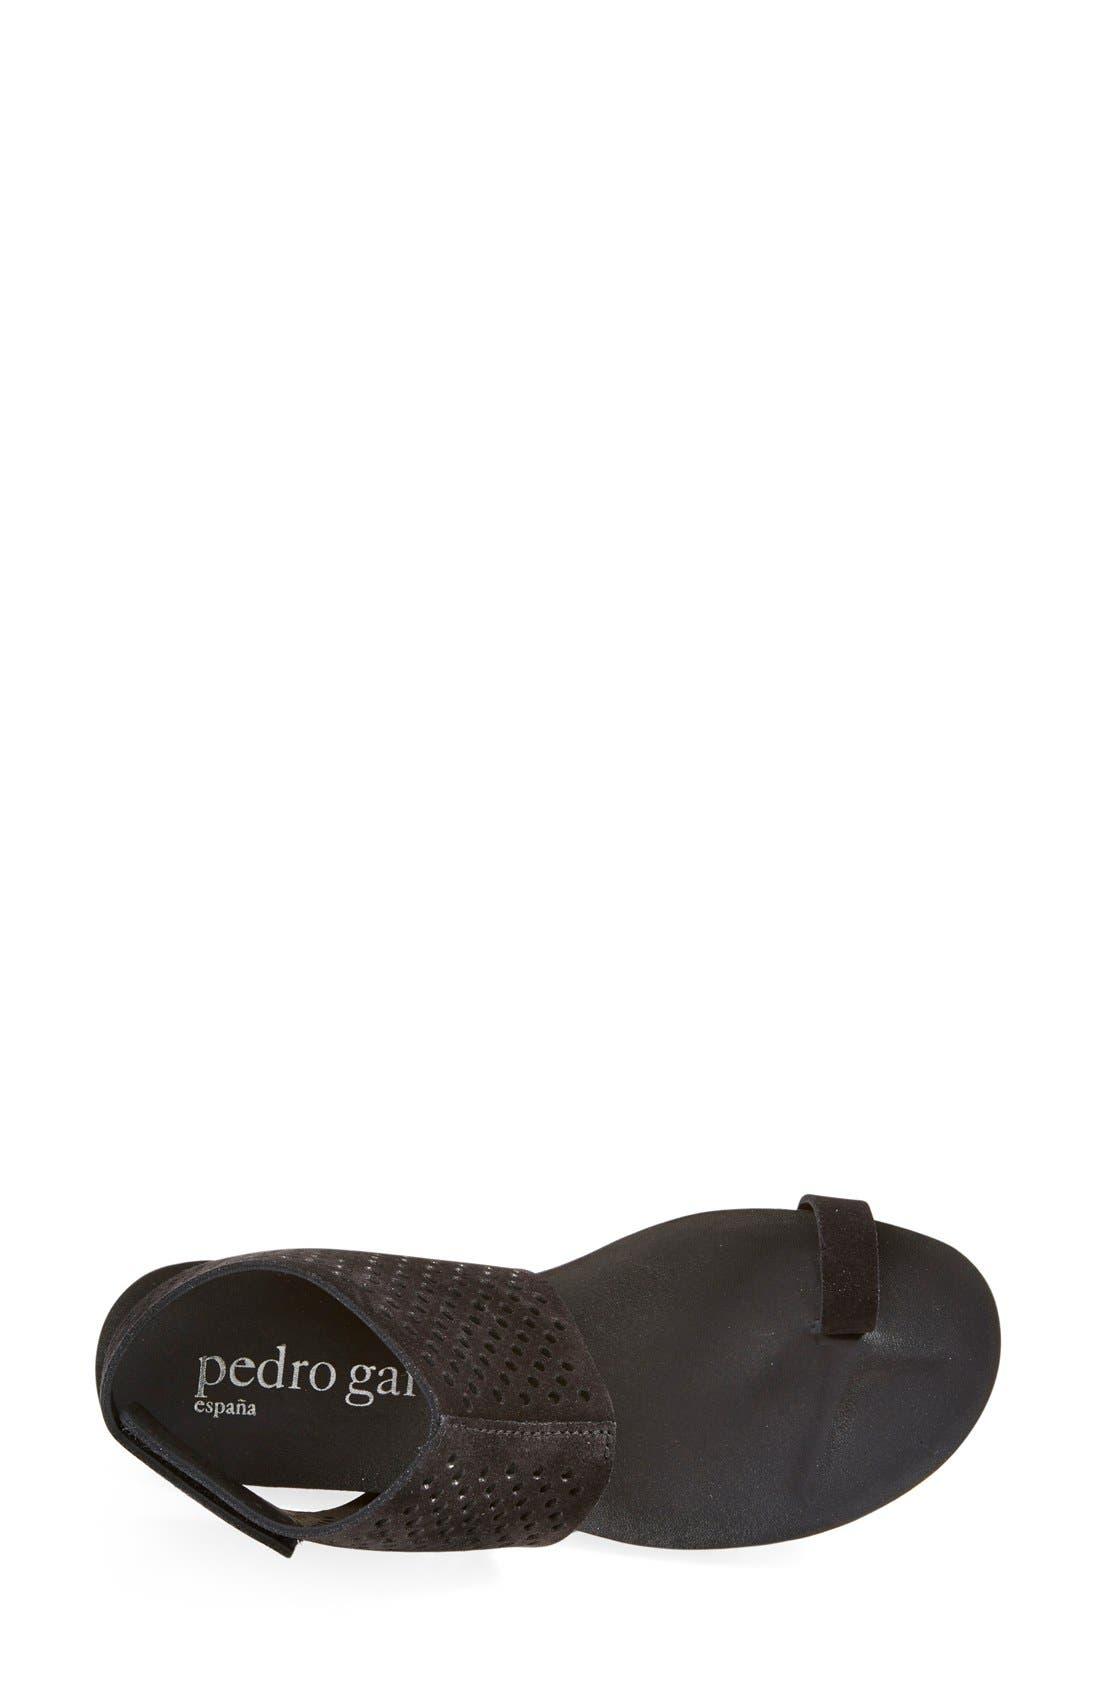 Alternate Image 3  - Pedro Garcia Perforated Ankle Cuff Sandal (Women)